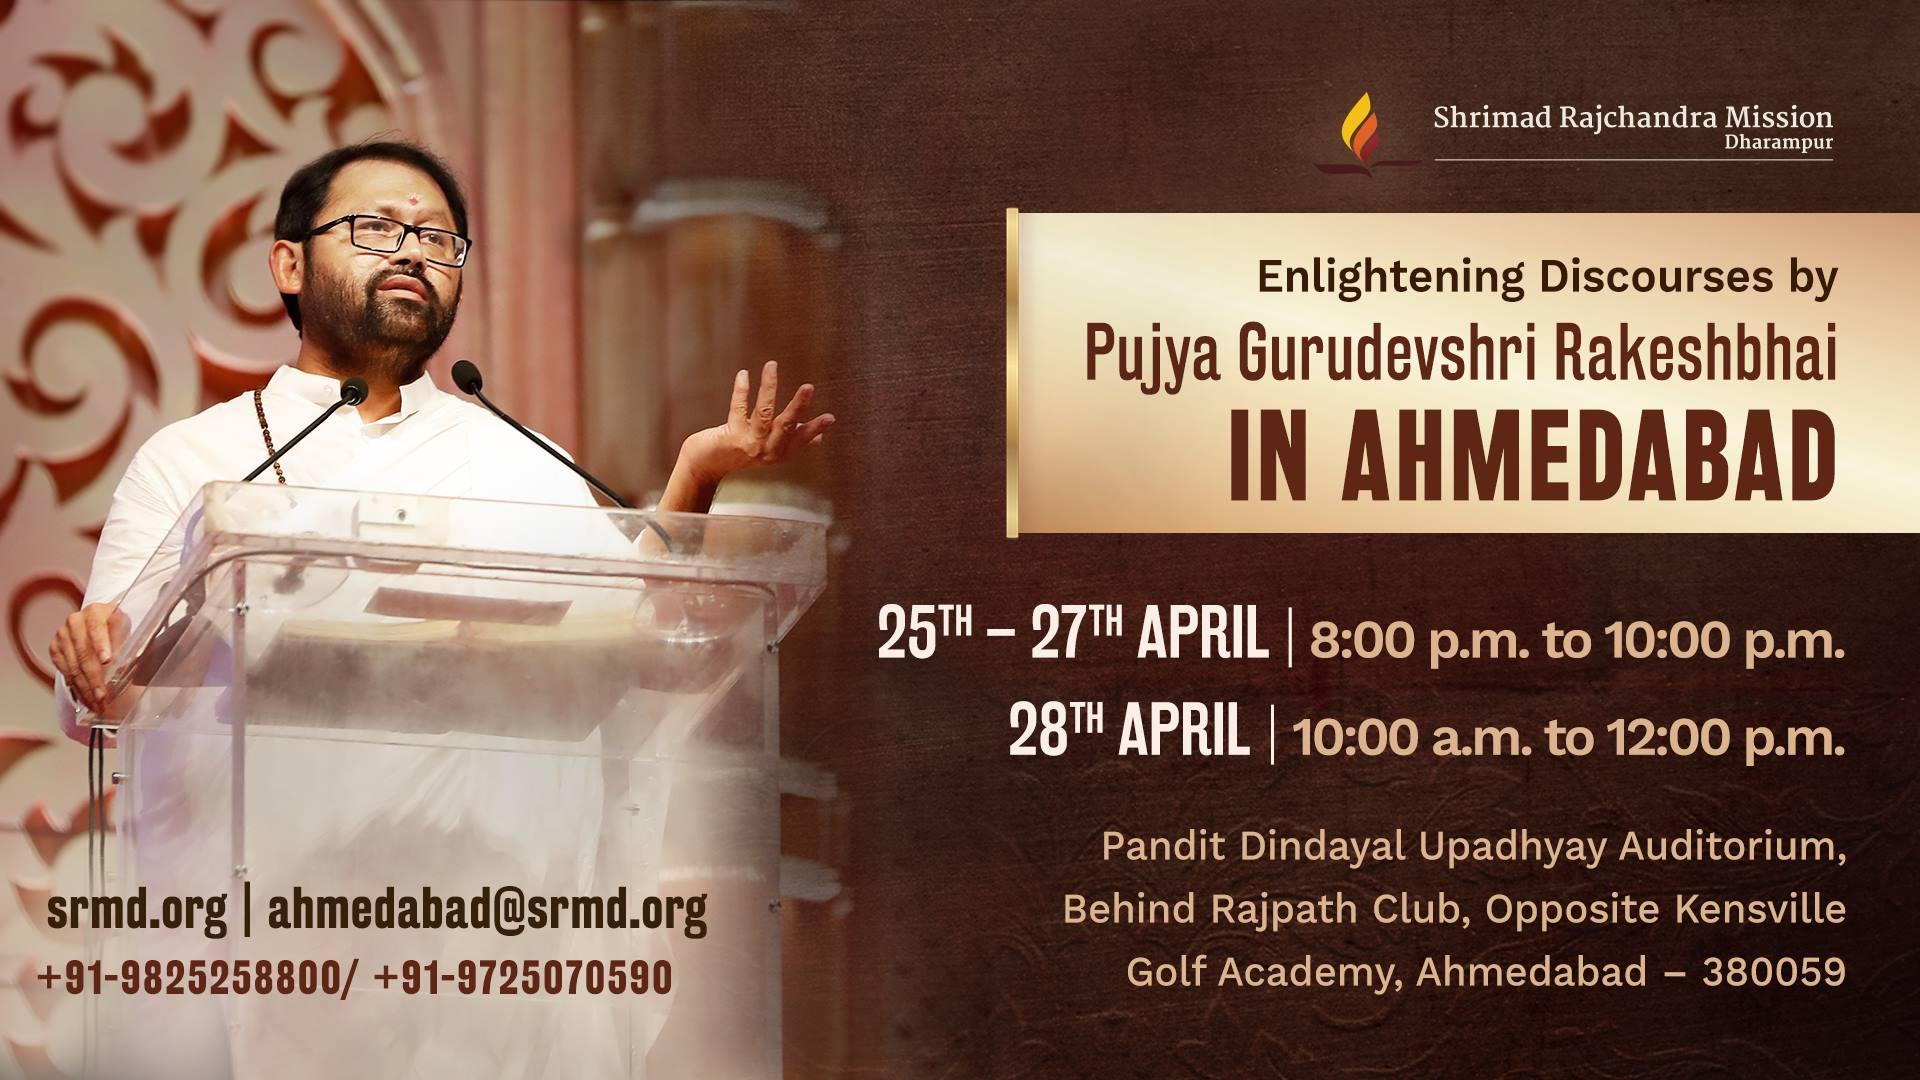 https://creativeyatra.com/wp-content/uploads/2019/04/Enlightening-Discourses-by-Pujya-Gurudevshri-in-Ahmedabad.jpg